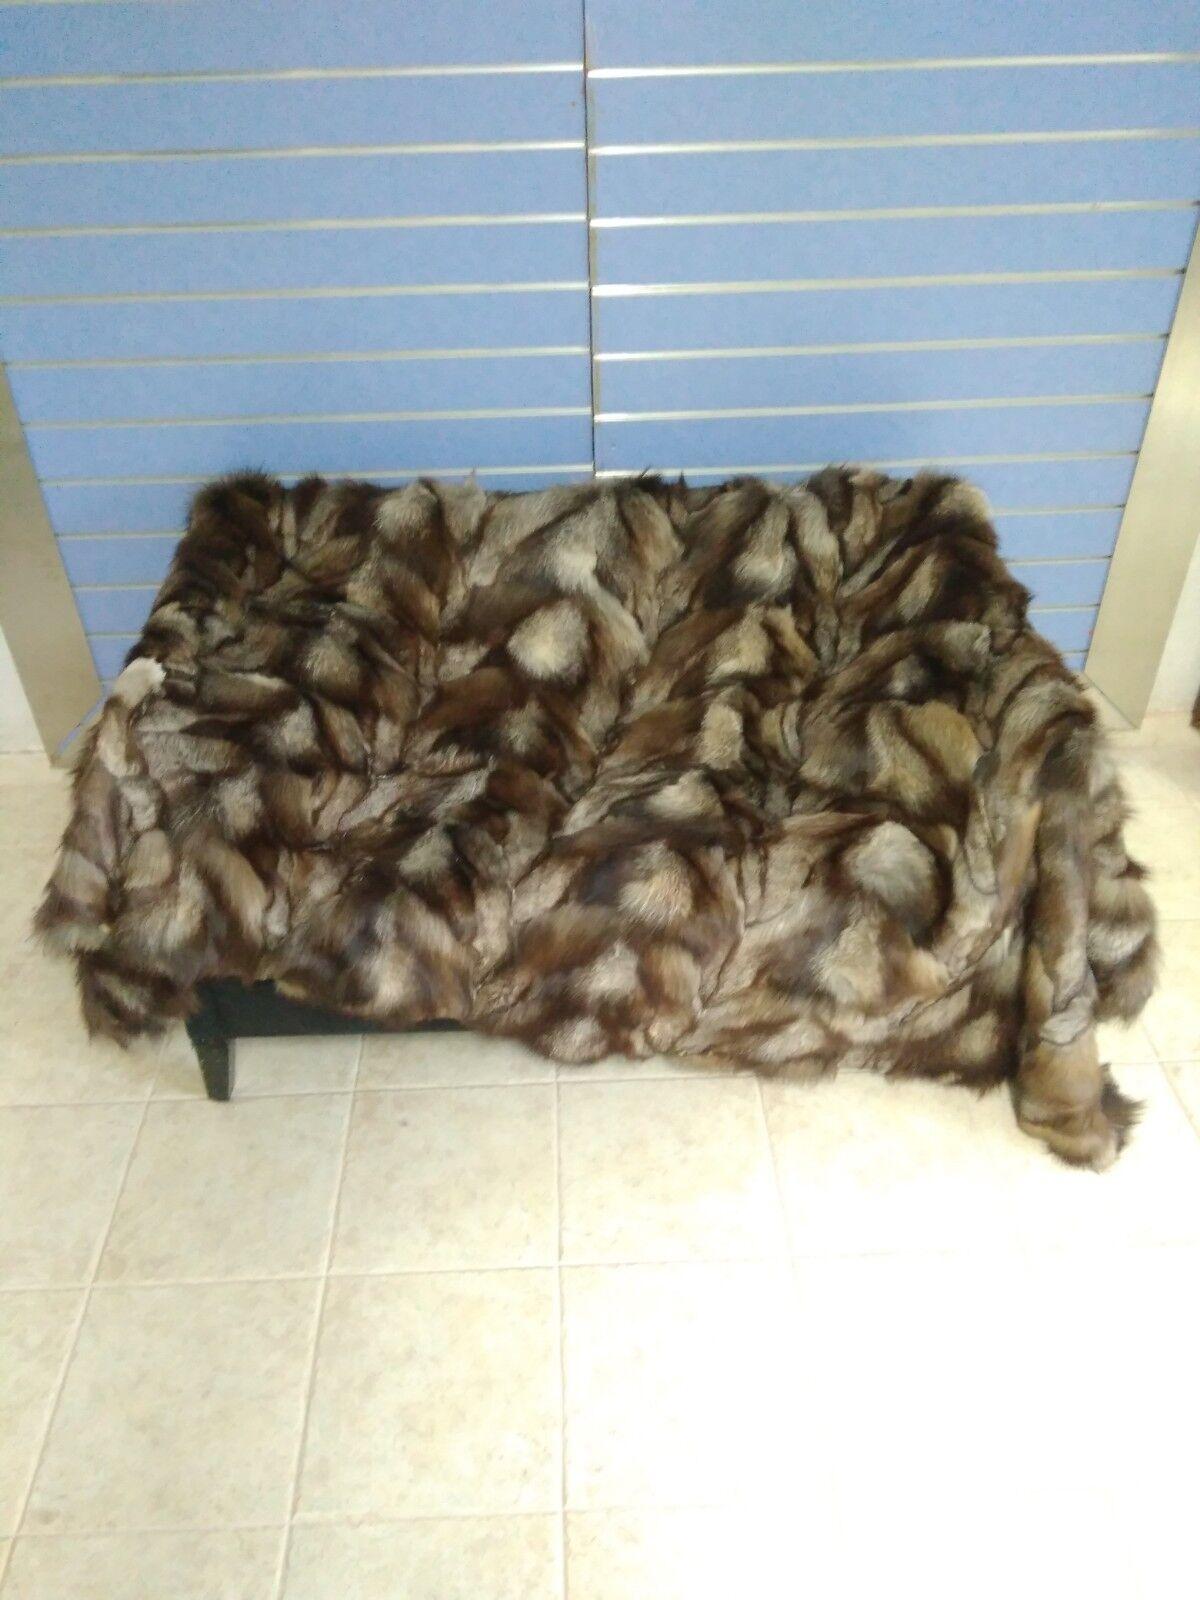 Luxury Crustal Fox Fur Throw Genuine Real Fox Fur Blanket   Bedspread